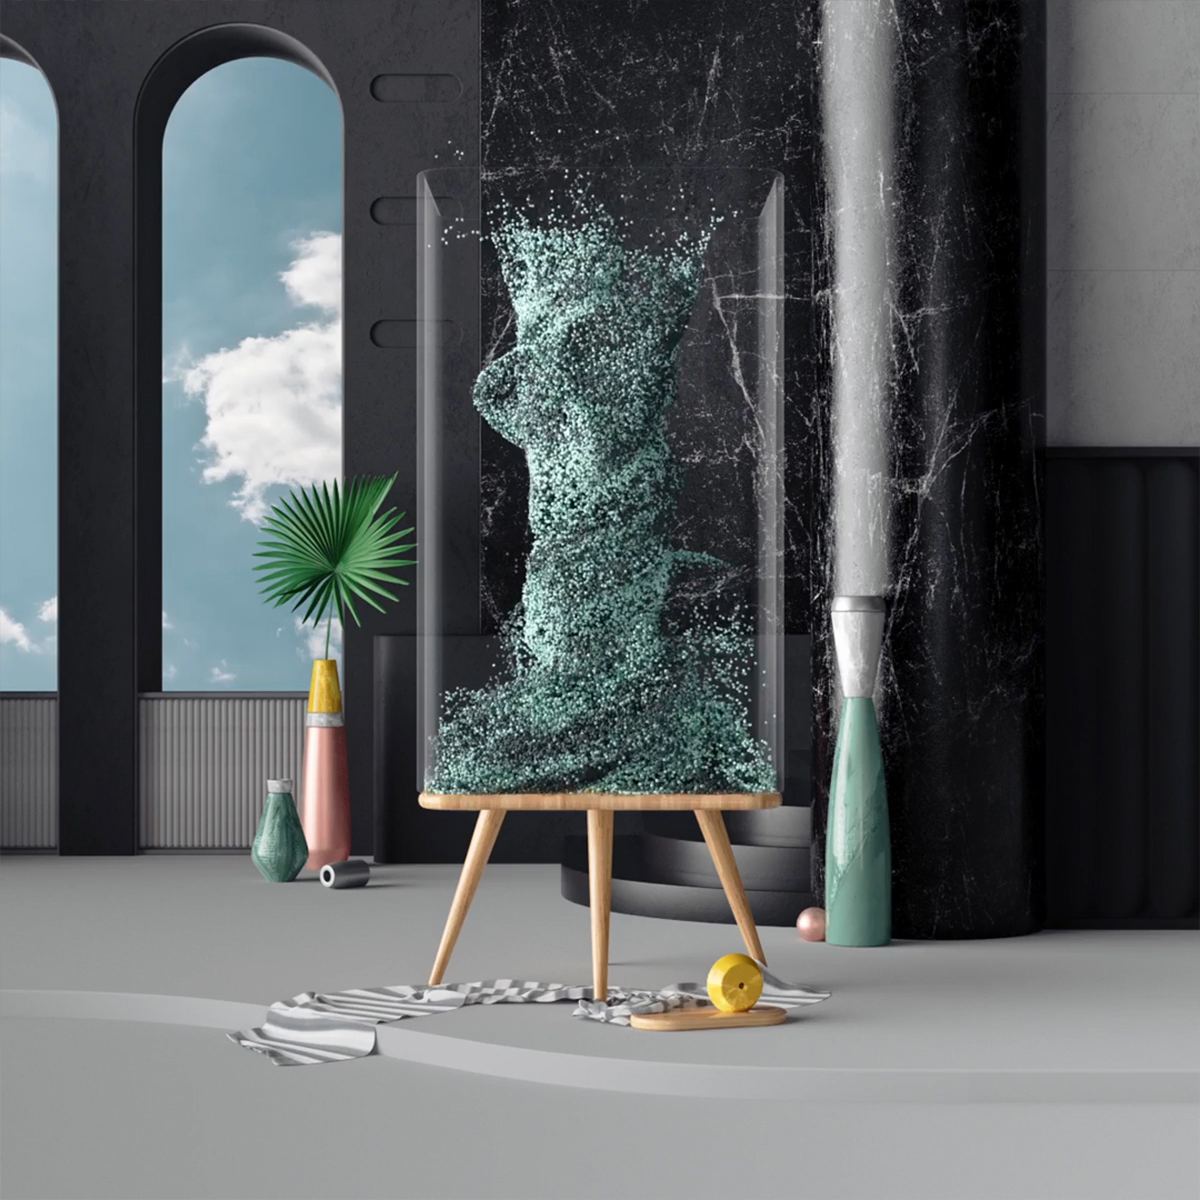 3D ILLUSTRATION  animation  Render krol mateusz CGI